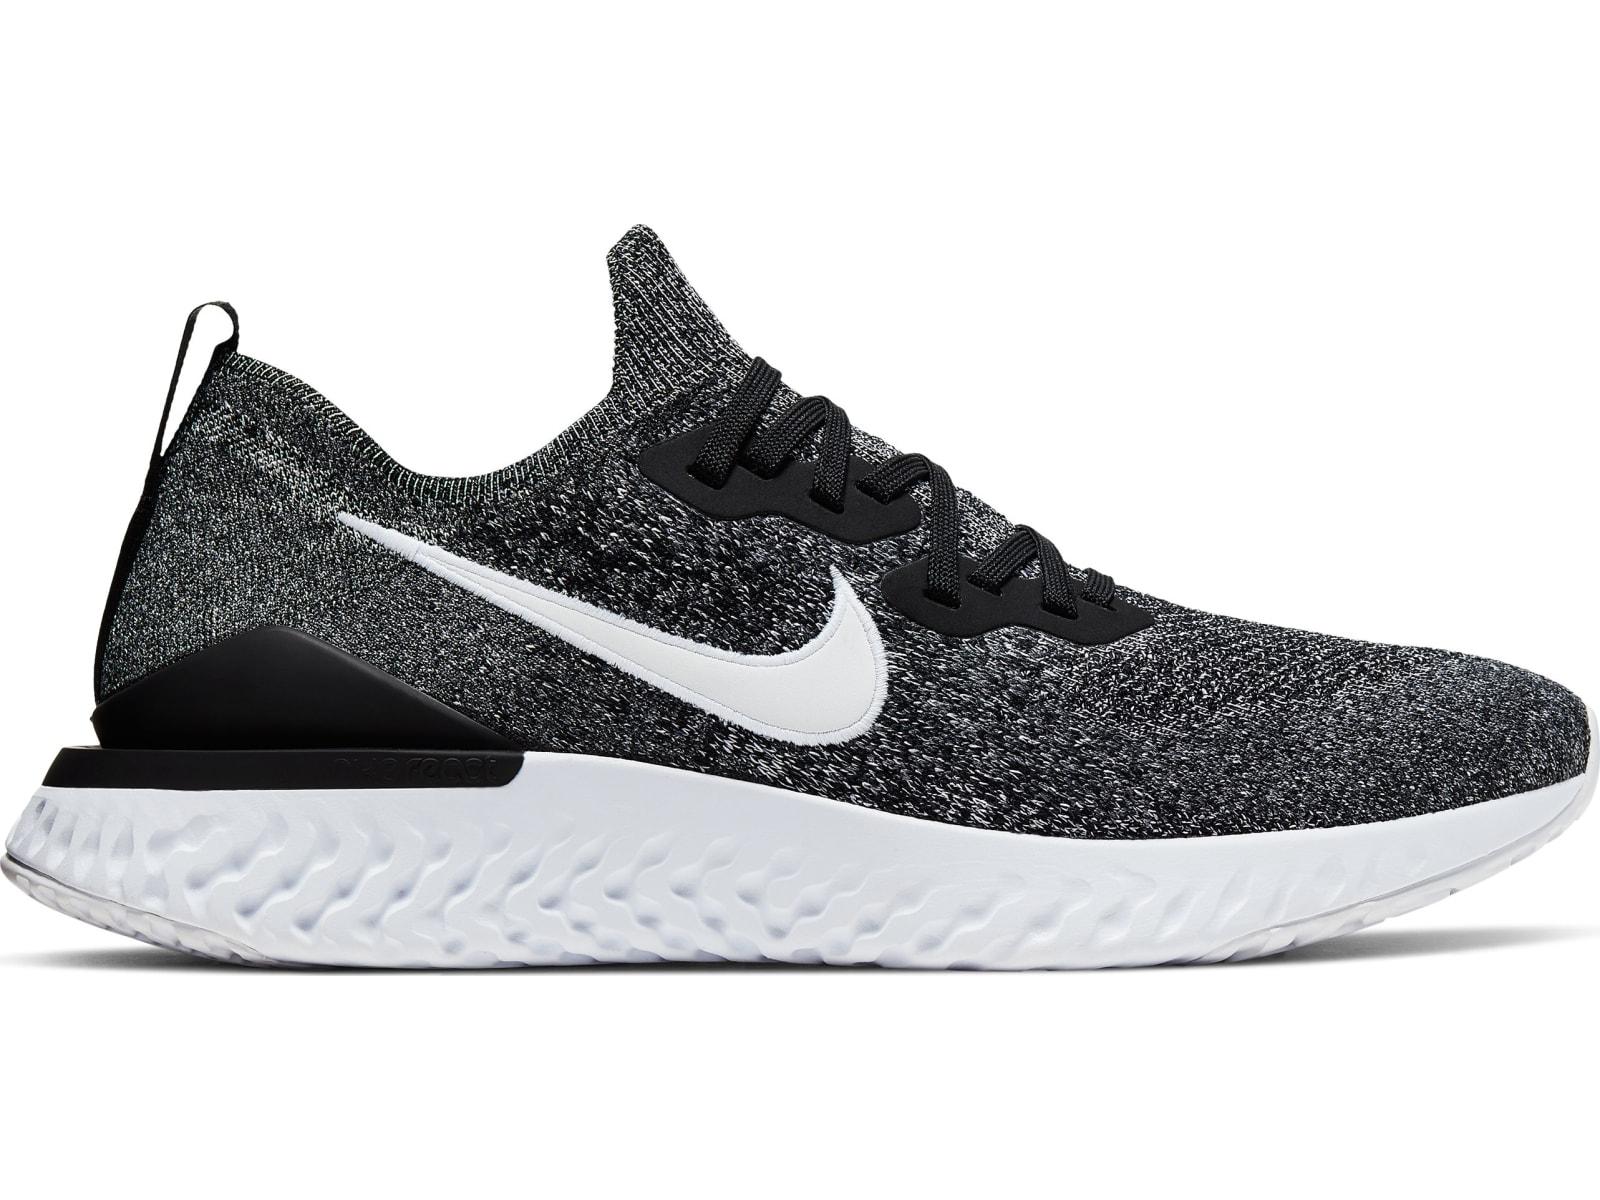 Nike Epic React Flyknit 2 Running Shoes BlackSapphire